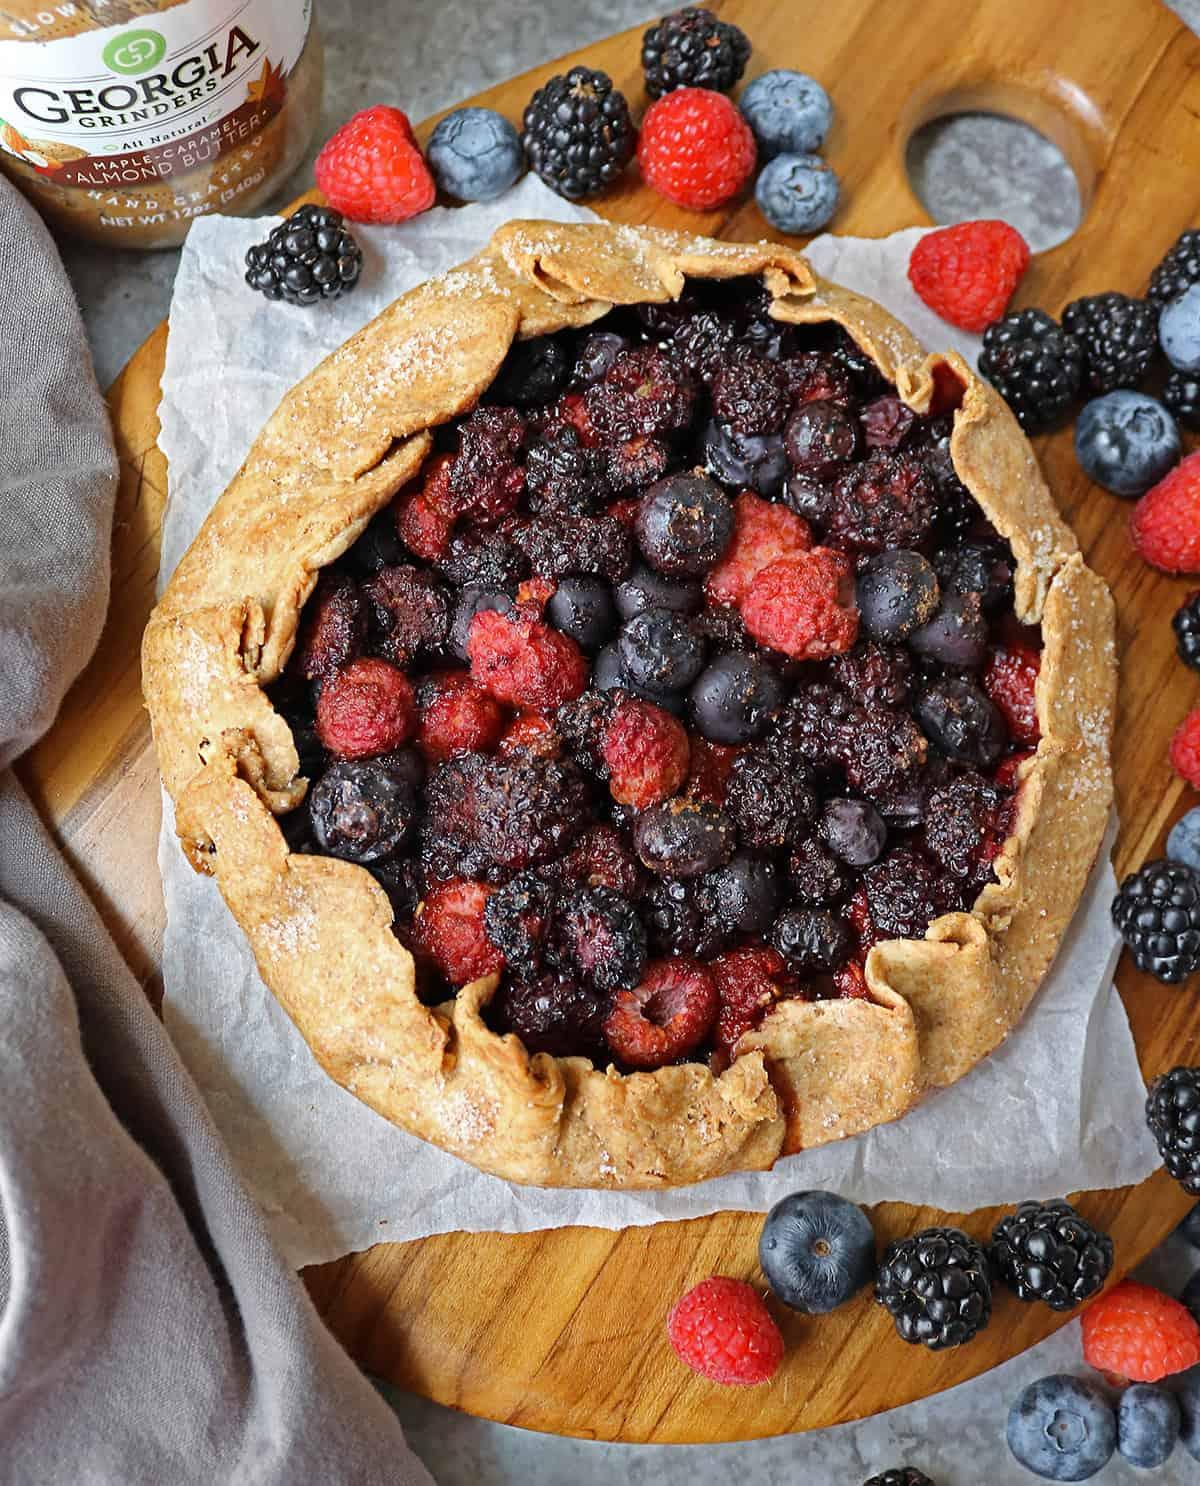 Tasty Easy Berry Galette made with raspberries, blueberries, and blackberries.